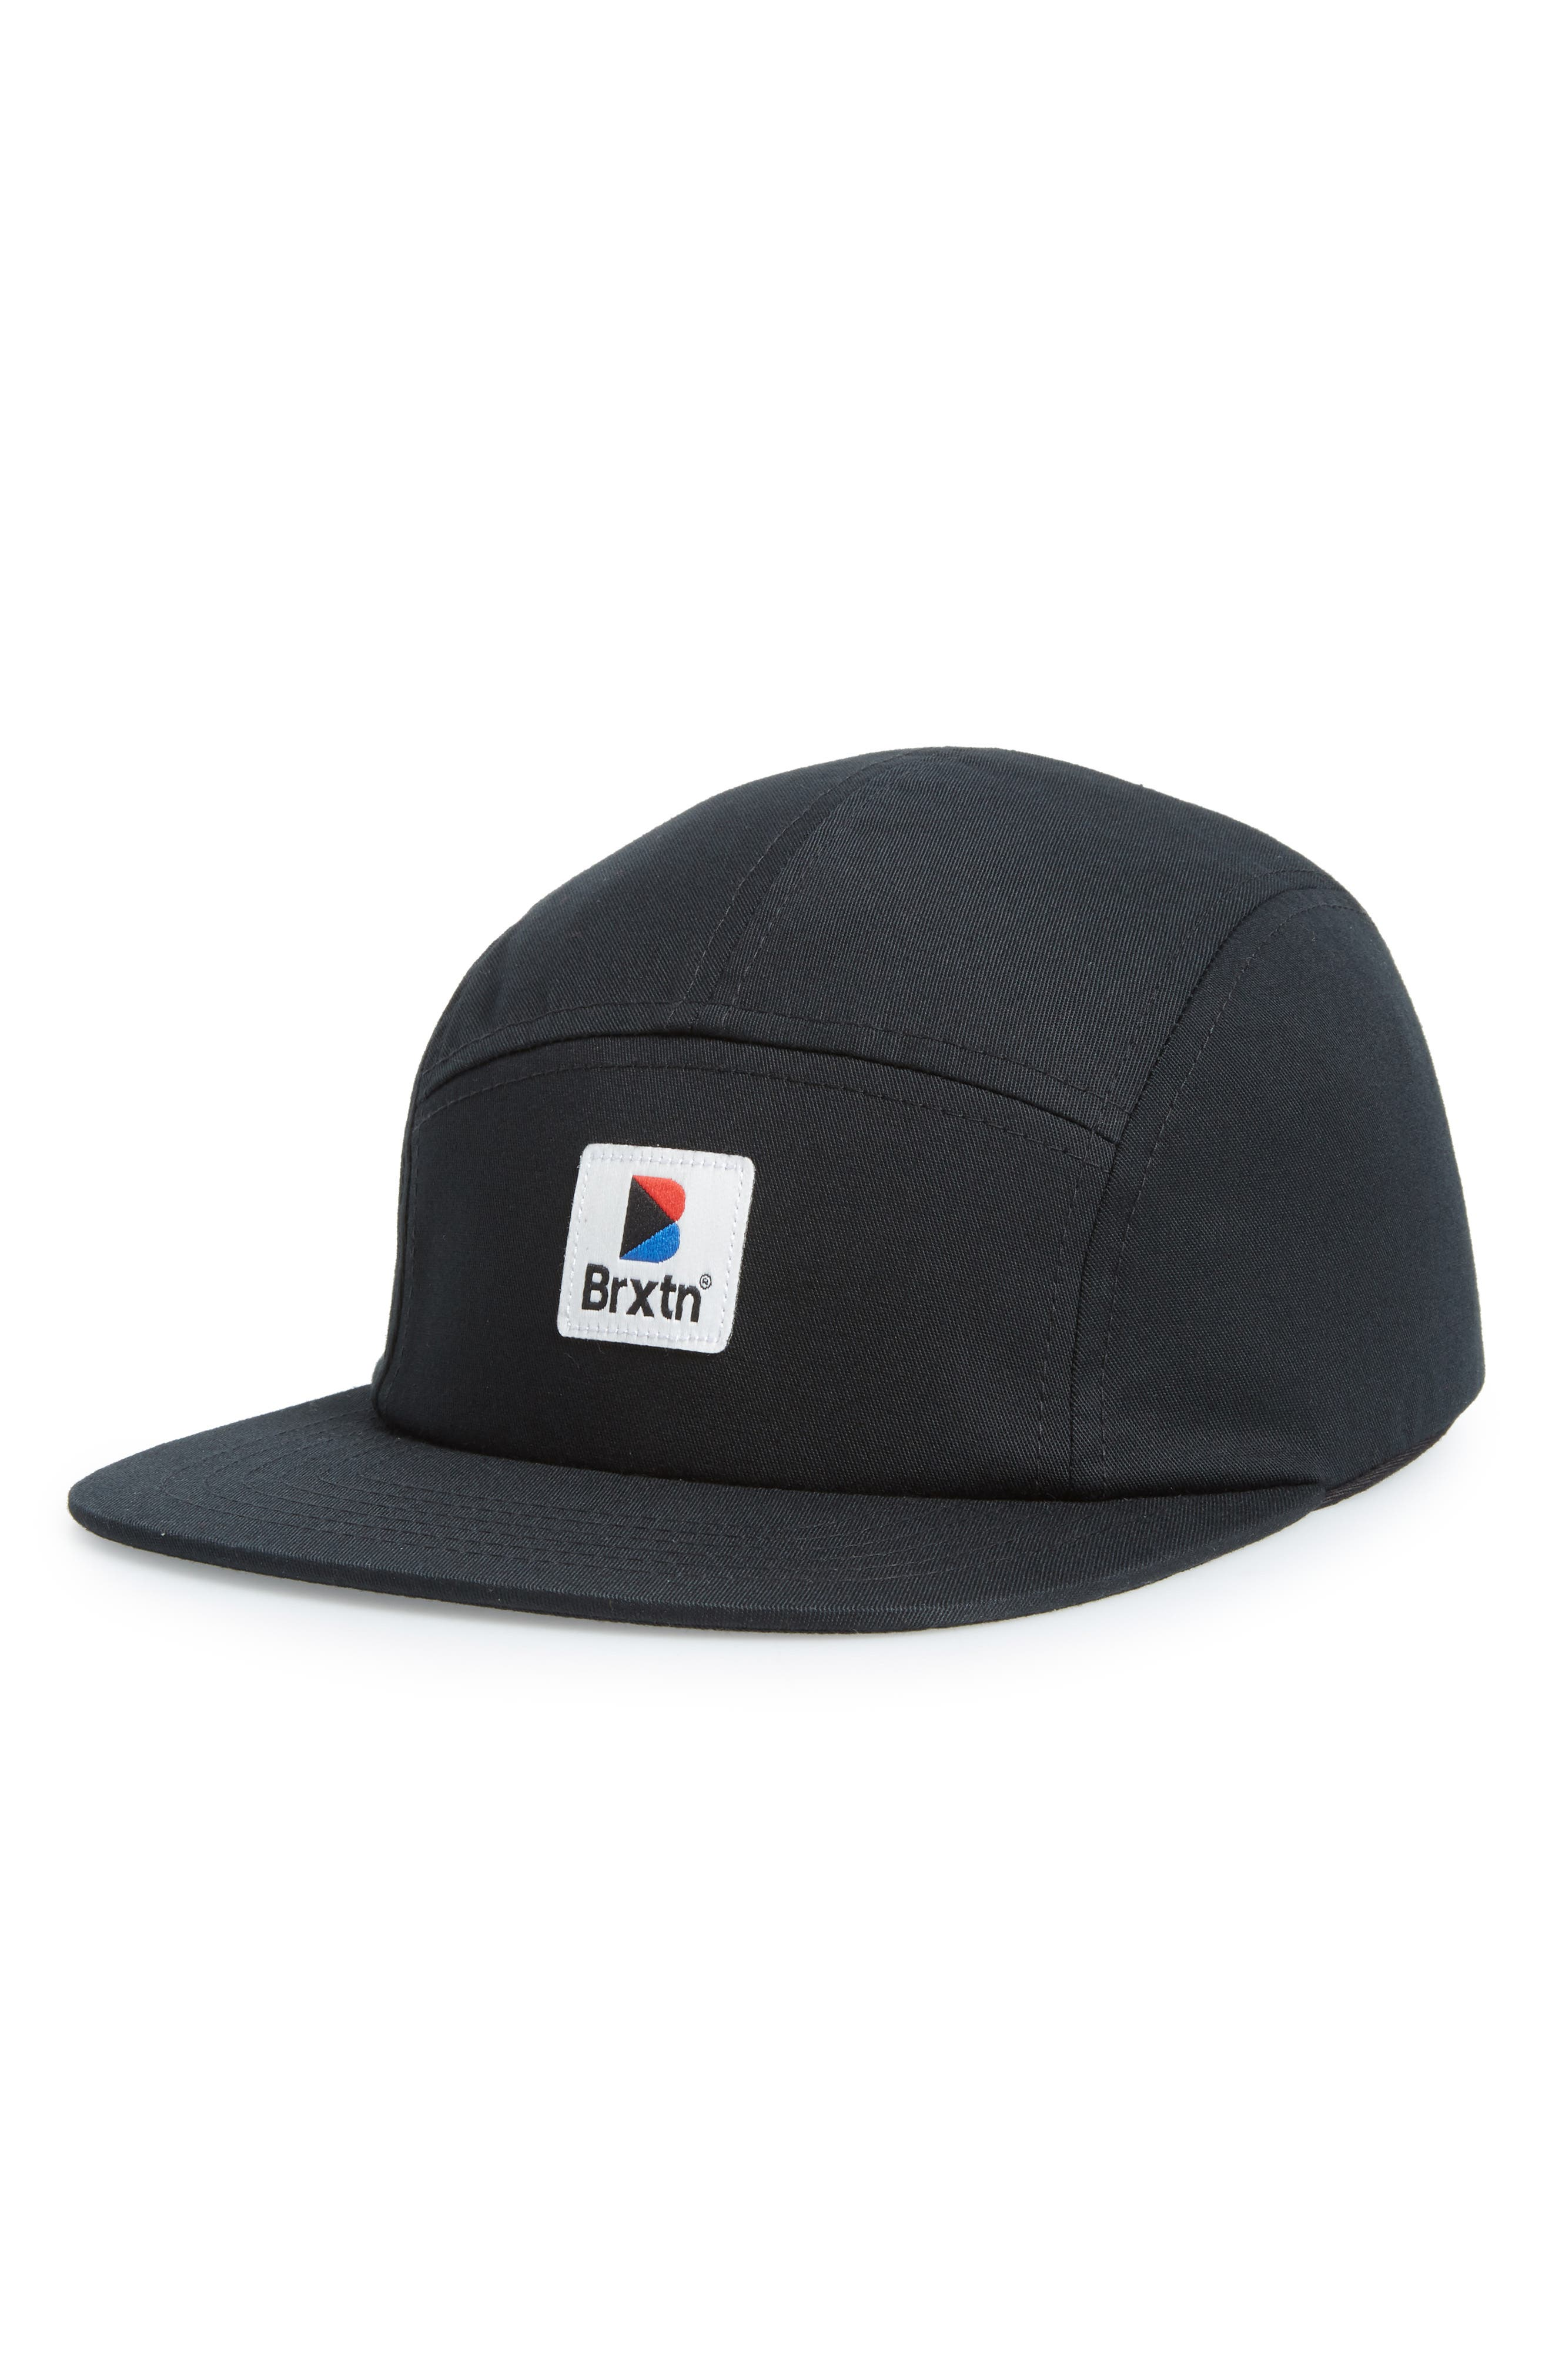 Stowell Baseball Cap,                             Main thumbnail 1, color,                             BLACK